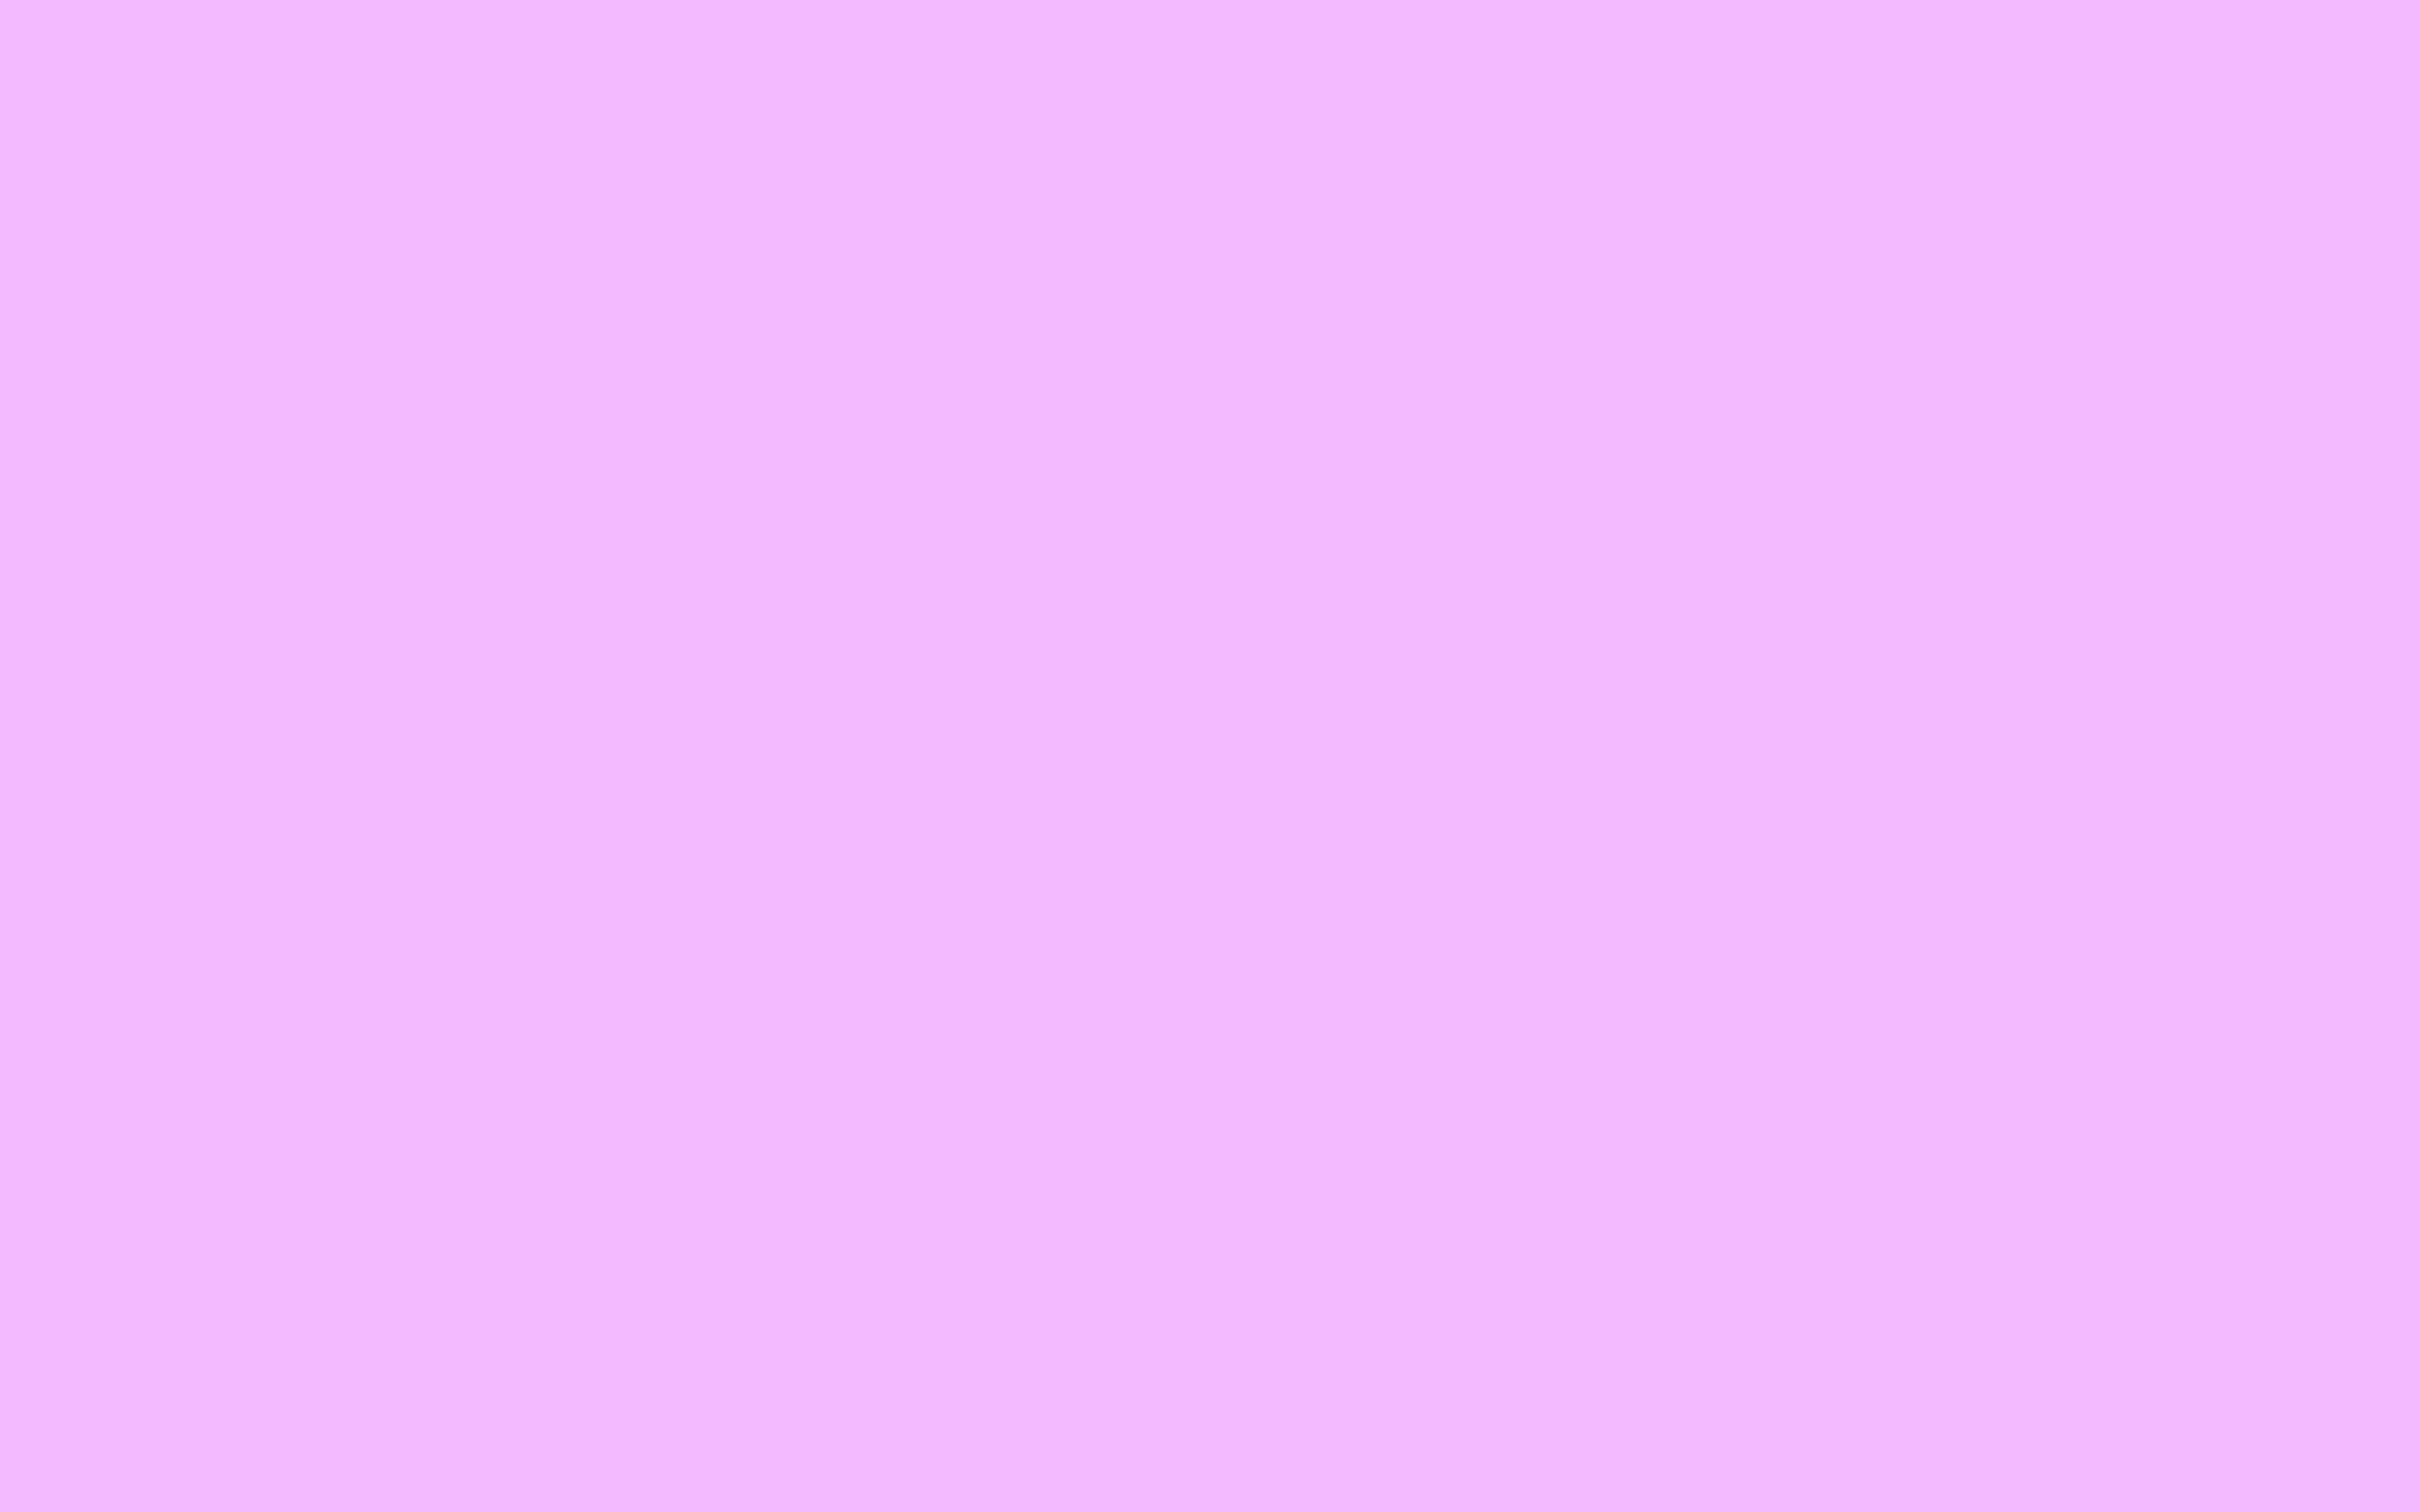 2560x1600 Brilliant Lavender Solid Color Background